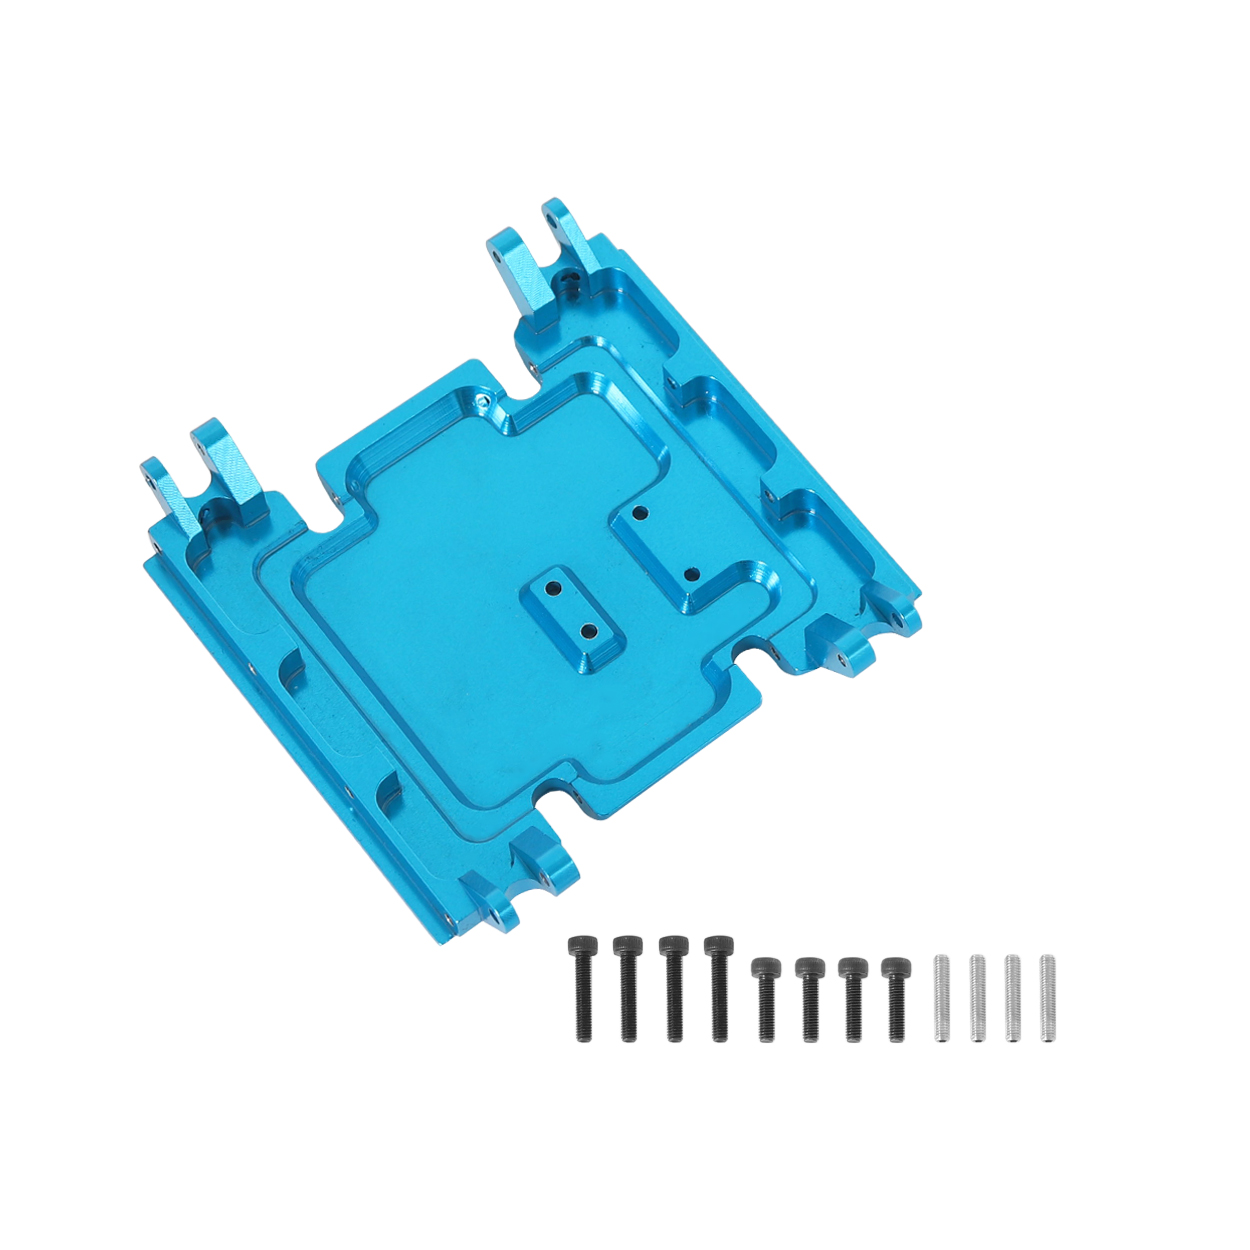 Center Gear Box Mount CNC Aluminum Skid Plate For 1:10 RC Crawler Car Axial Wraith 90018 blue